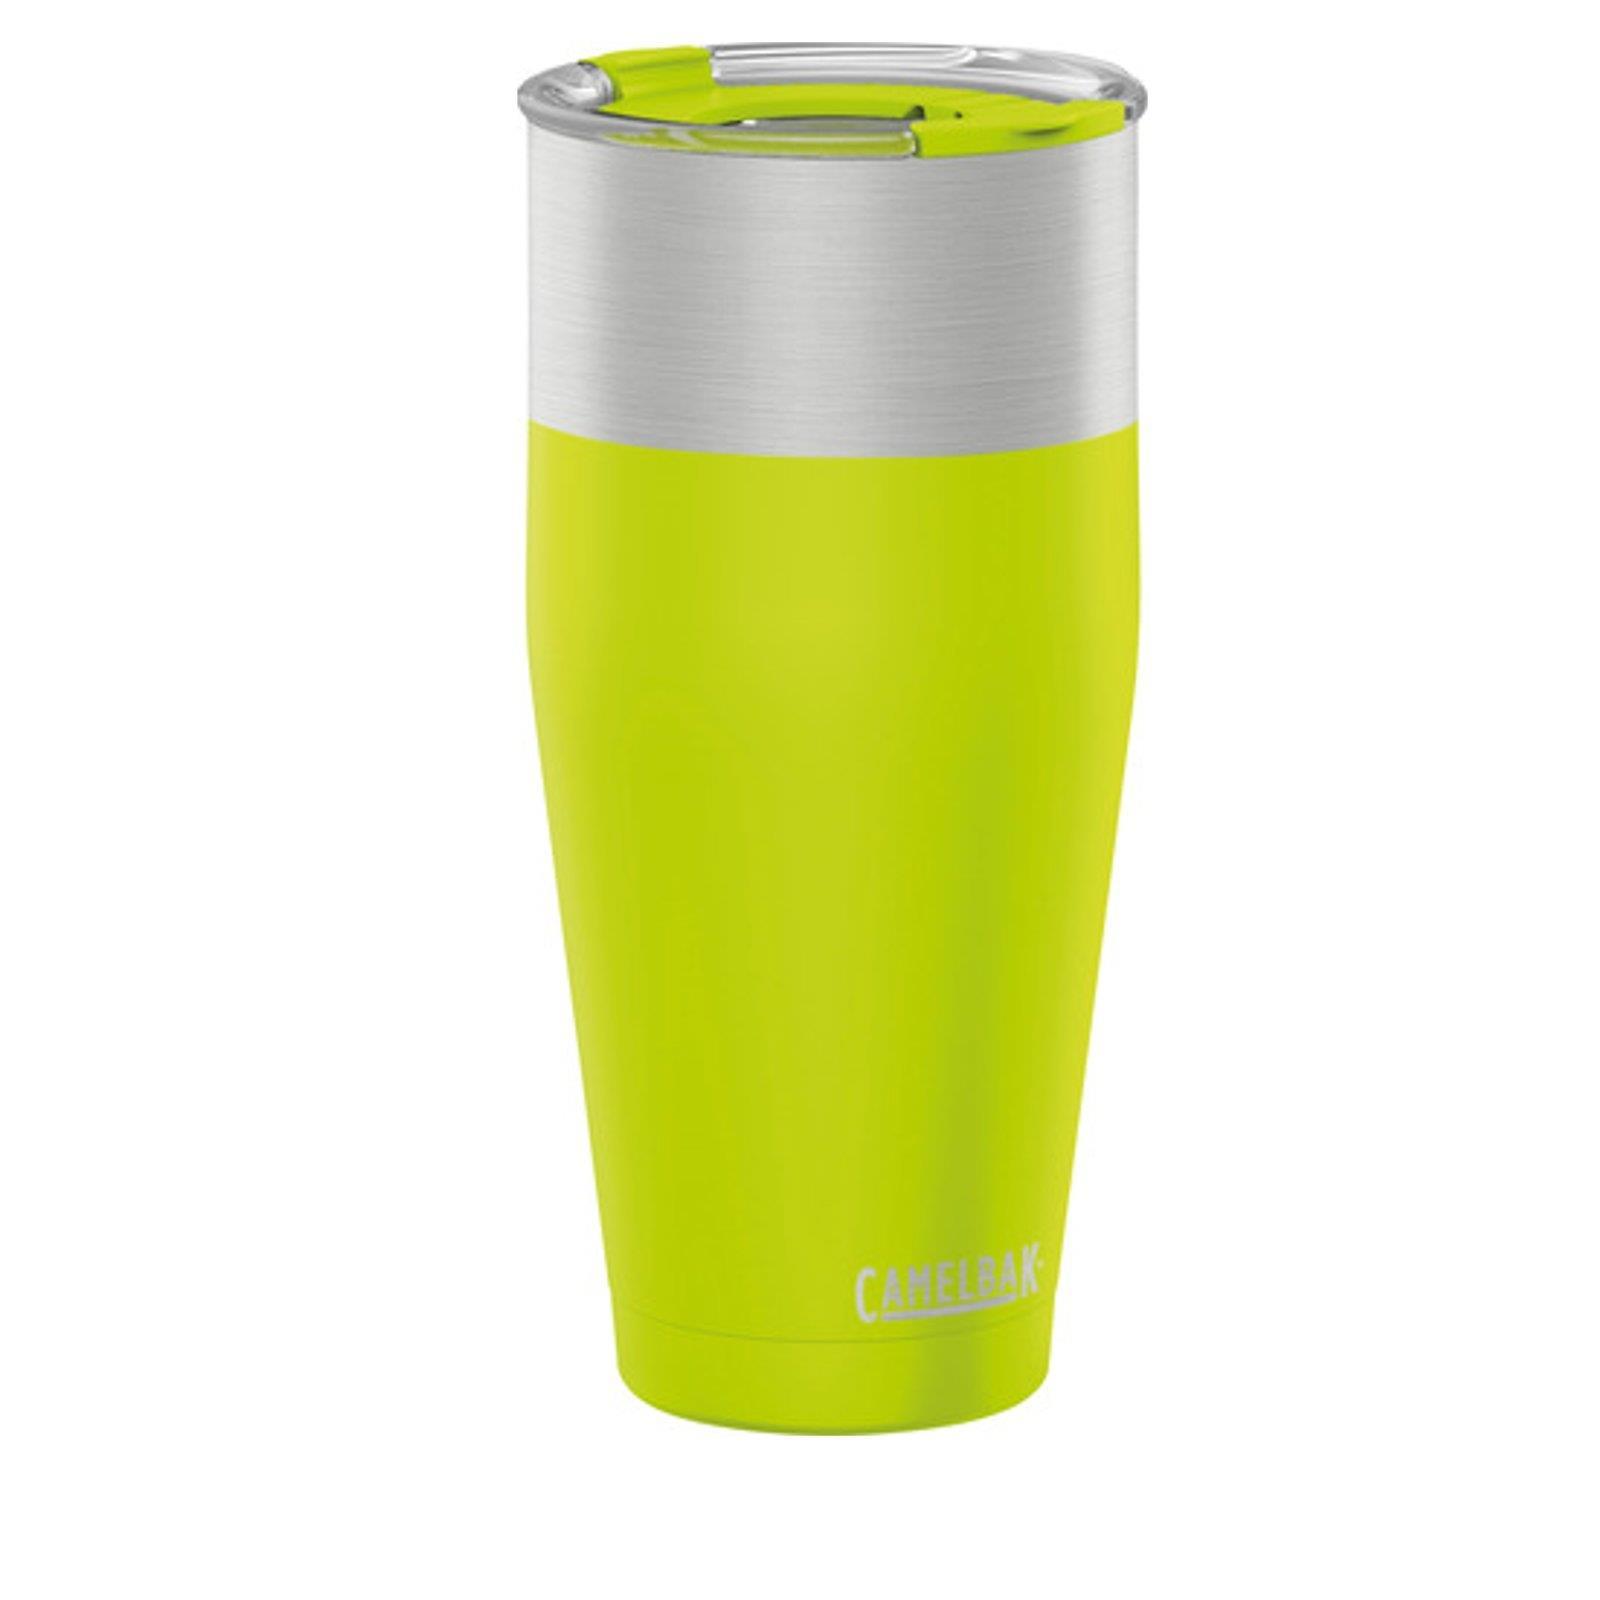 Camelbak-Kickbak-Edelstahl-Thermo-Trink-Auto-Becher-600ml-900ml-Isoliert-Kaffee Indexbild 8